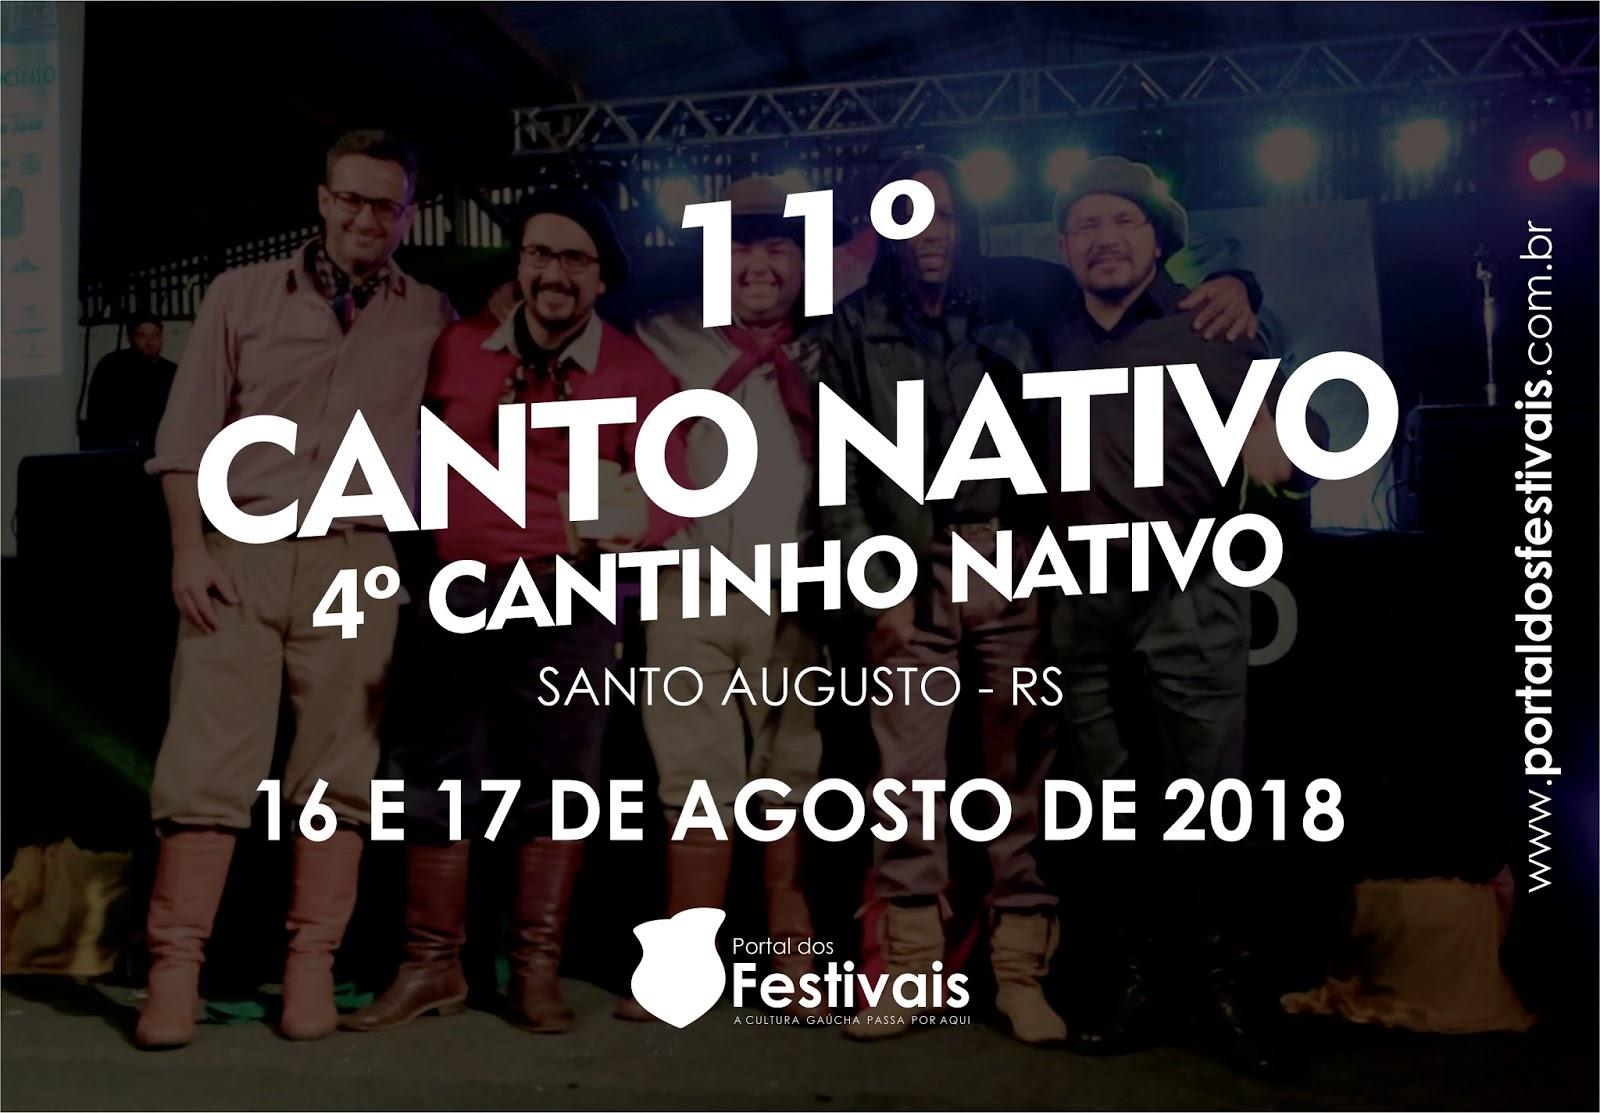 Vem aí o 11º Canto Nativo da cidade de Santo Augusto